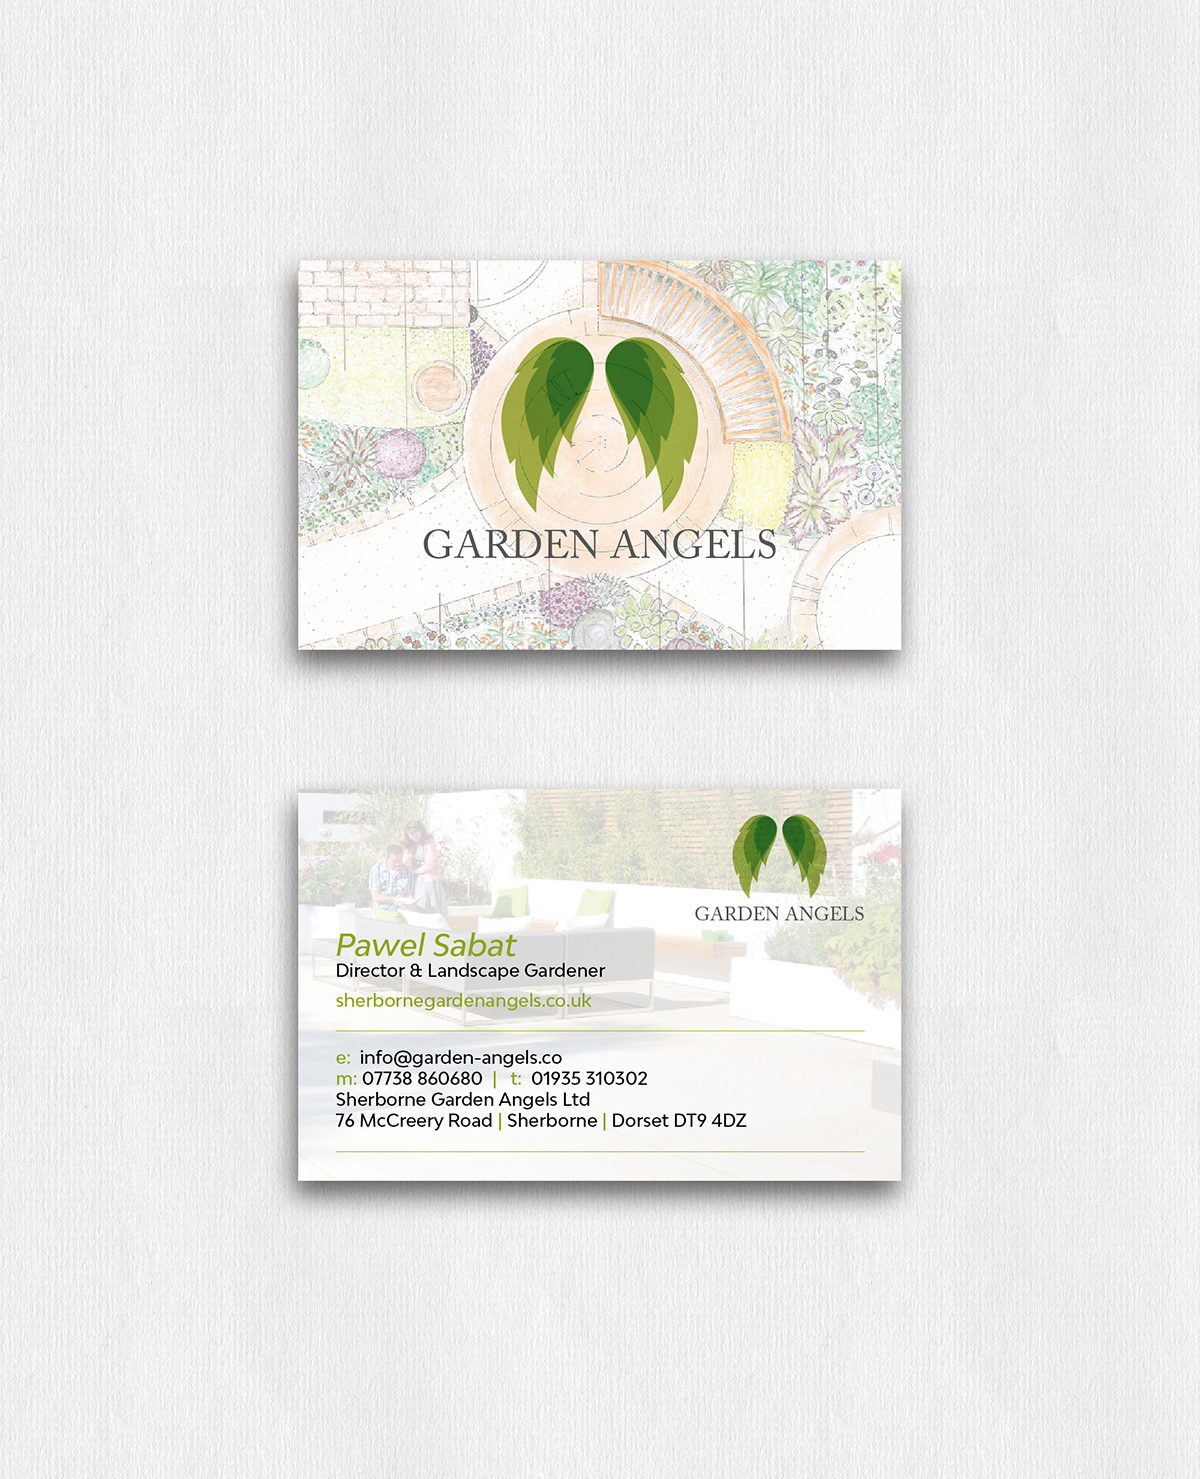 ls — Business Card Design Dorset